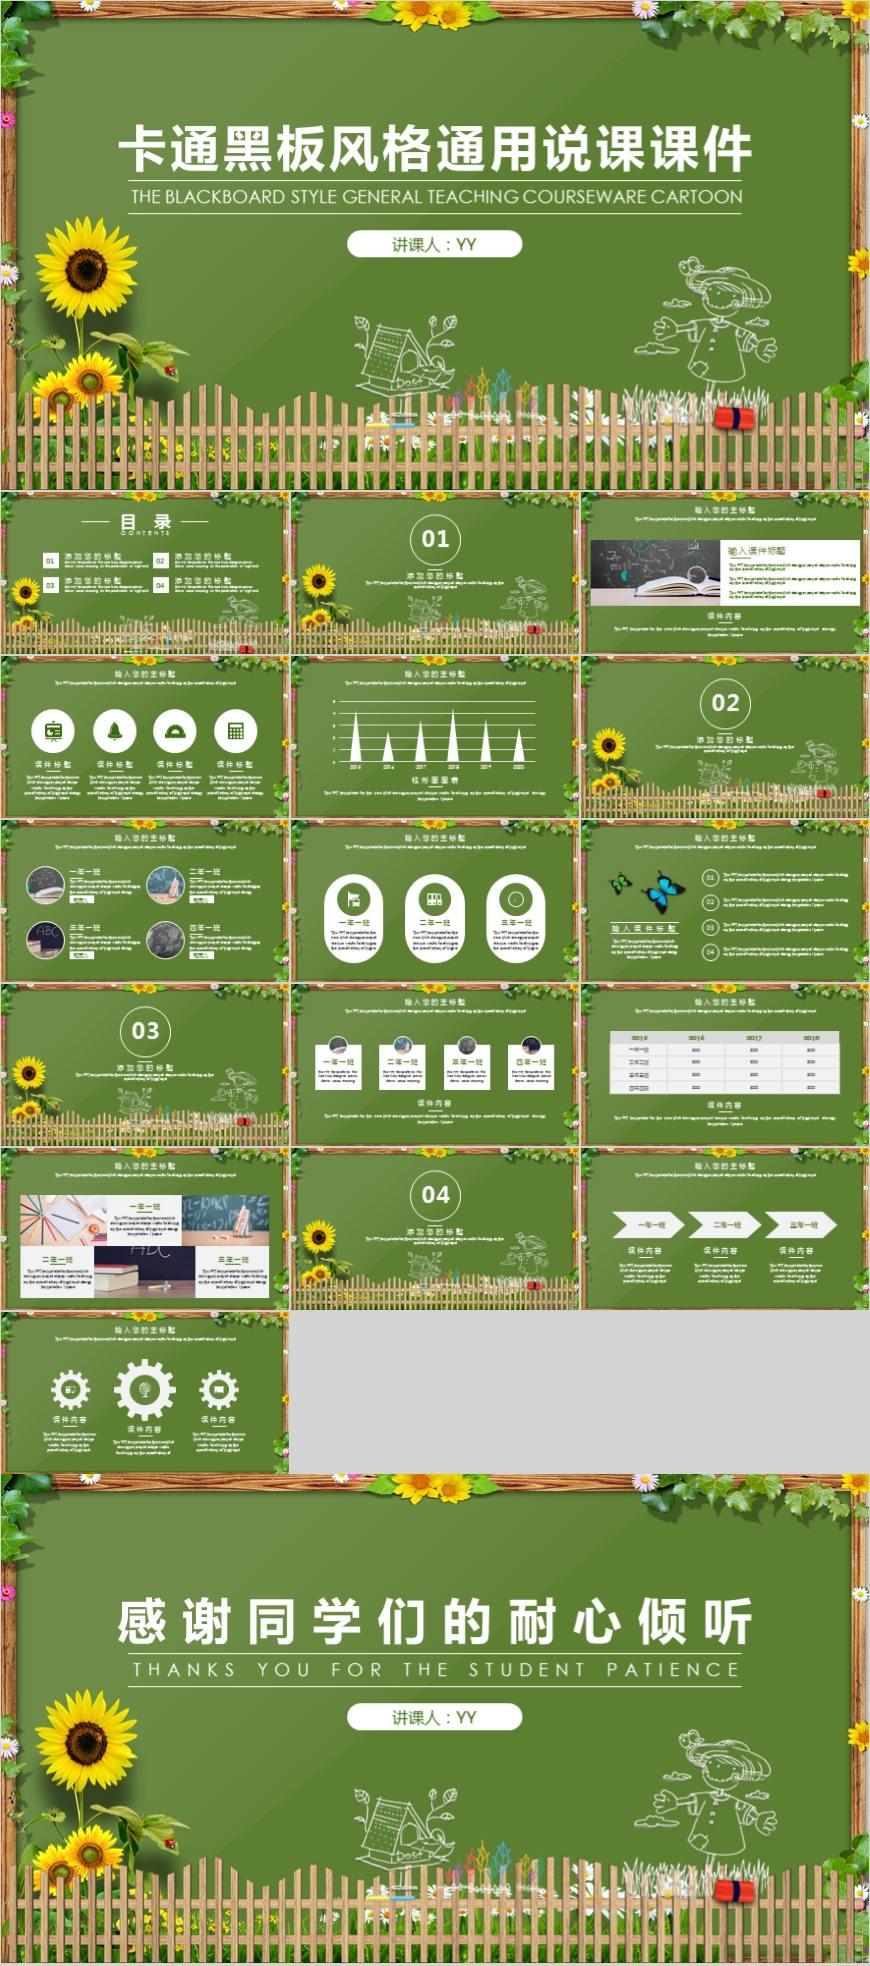 YY0031 创意田园黑板风教学课件PPT模板